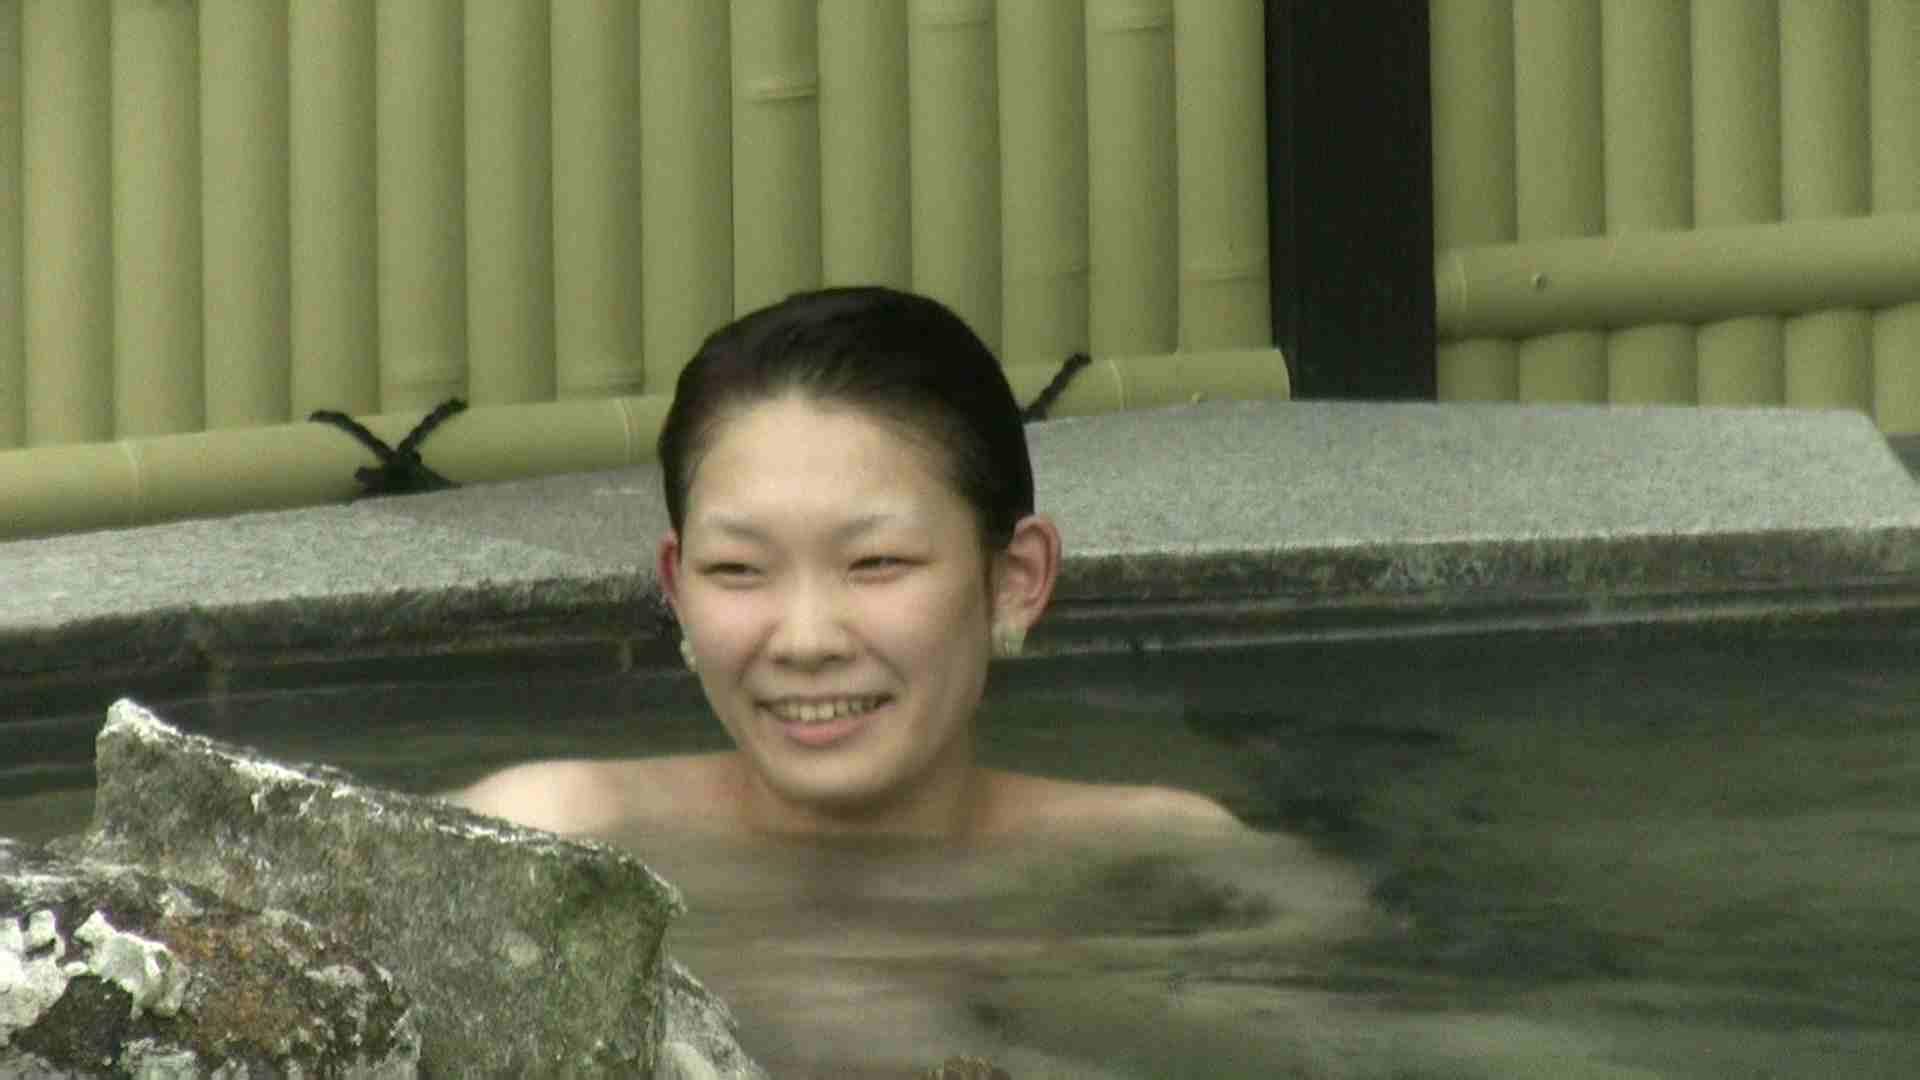 Aquaな露天風呂Vol.670 いやらしいOL アダルト動画キャプチャ 81連発 2